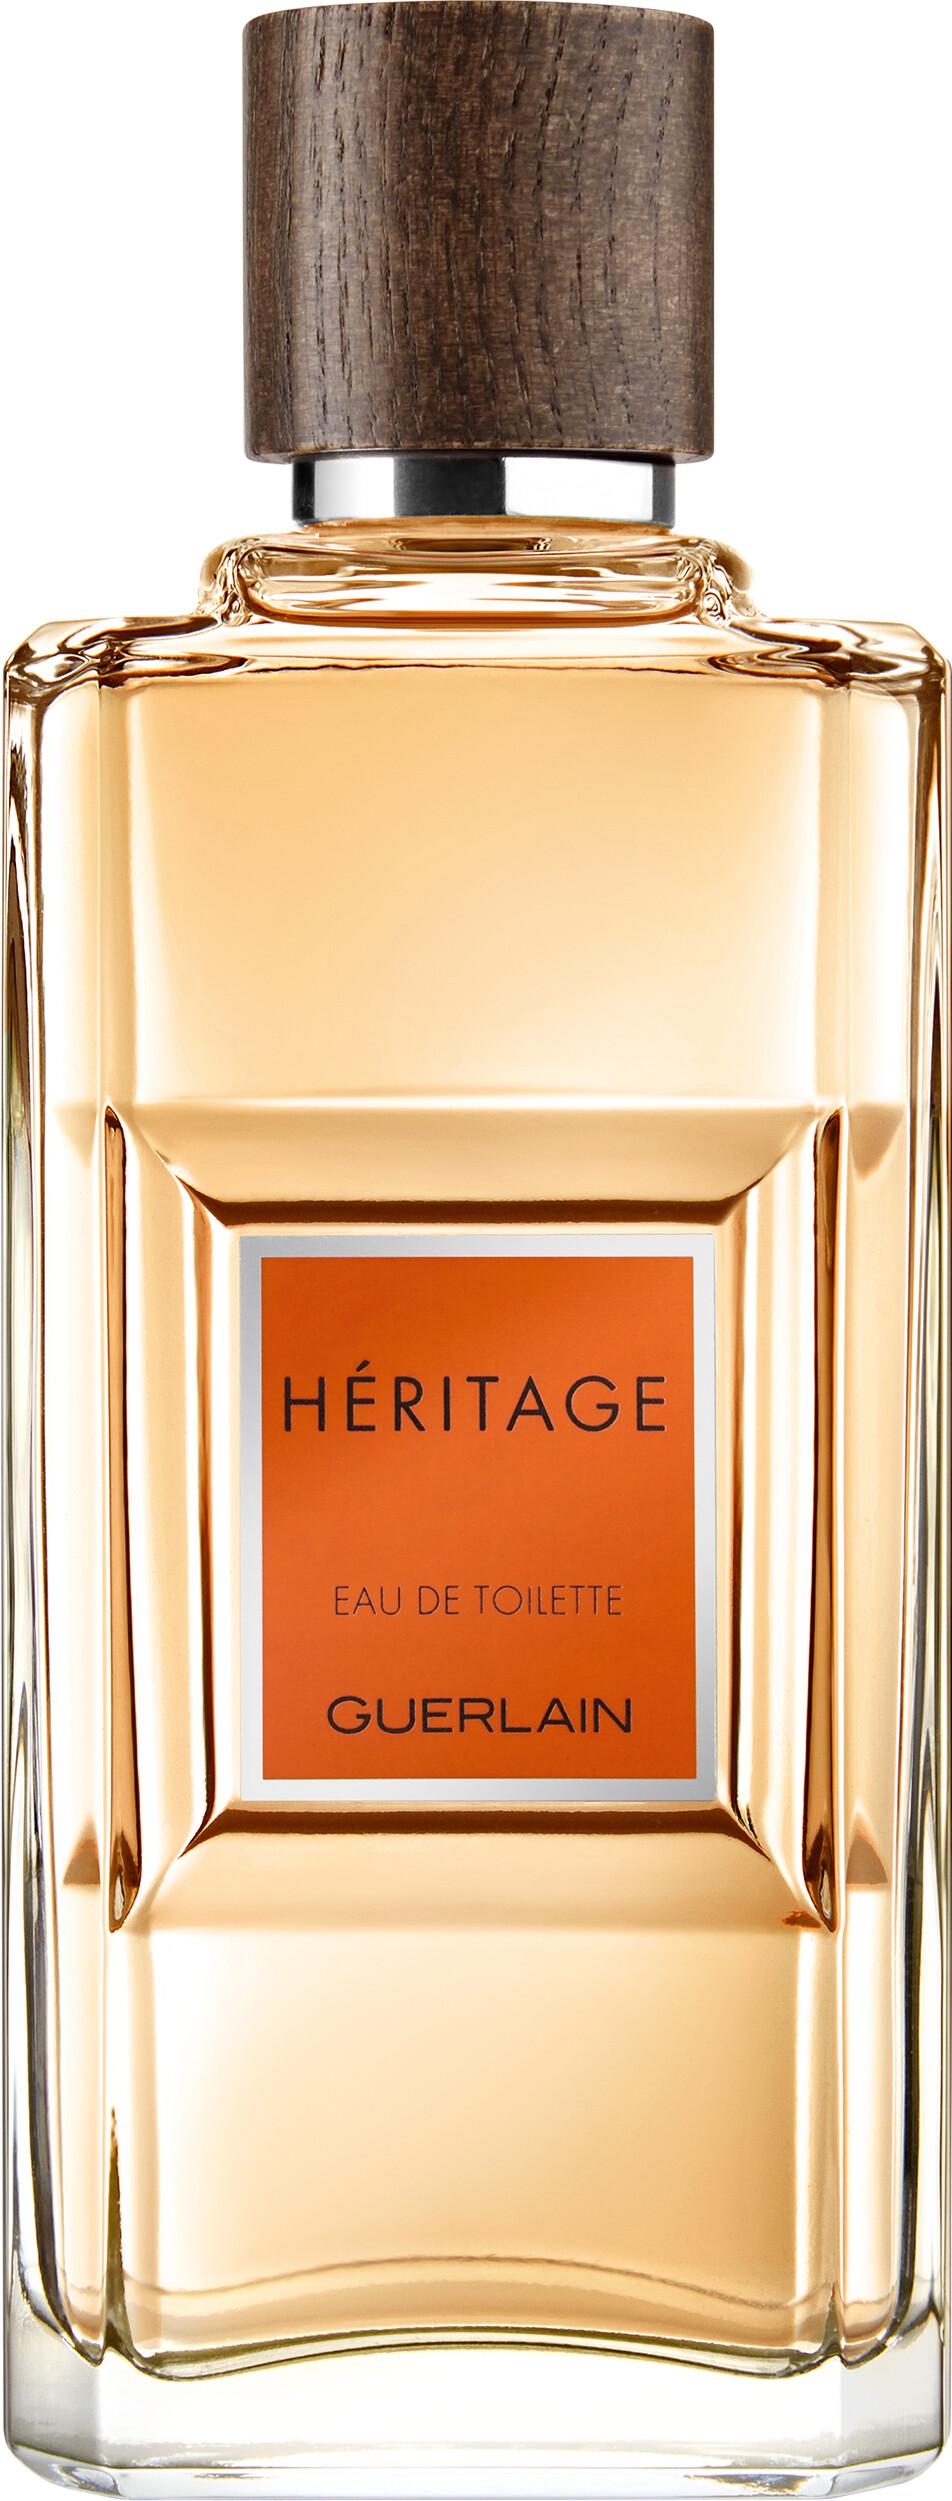 guerlain heritage eau de toilette spray. Black Bedroom Furniture Sets. Home Design Ideas